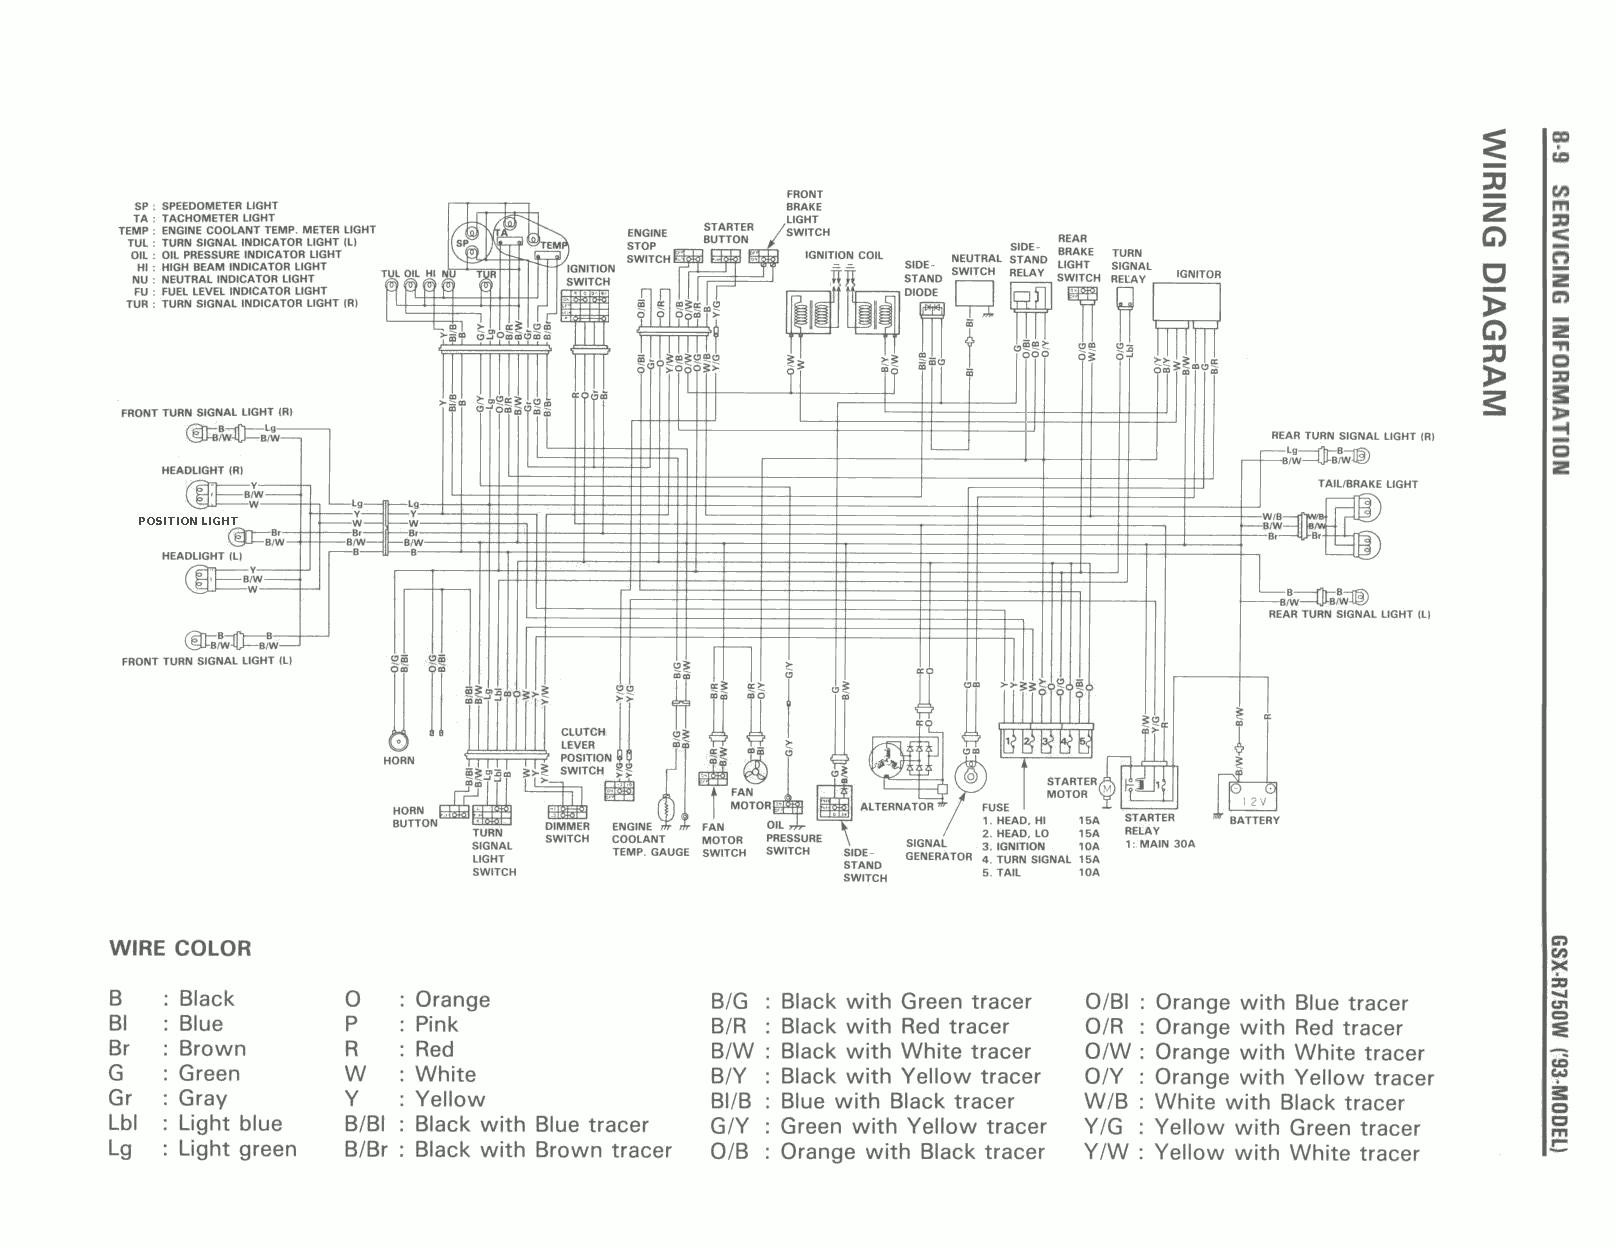 k 6 gsxr 1000 wiring diagram wiring schematics diagram rh enr green com